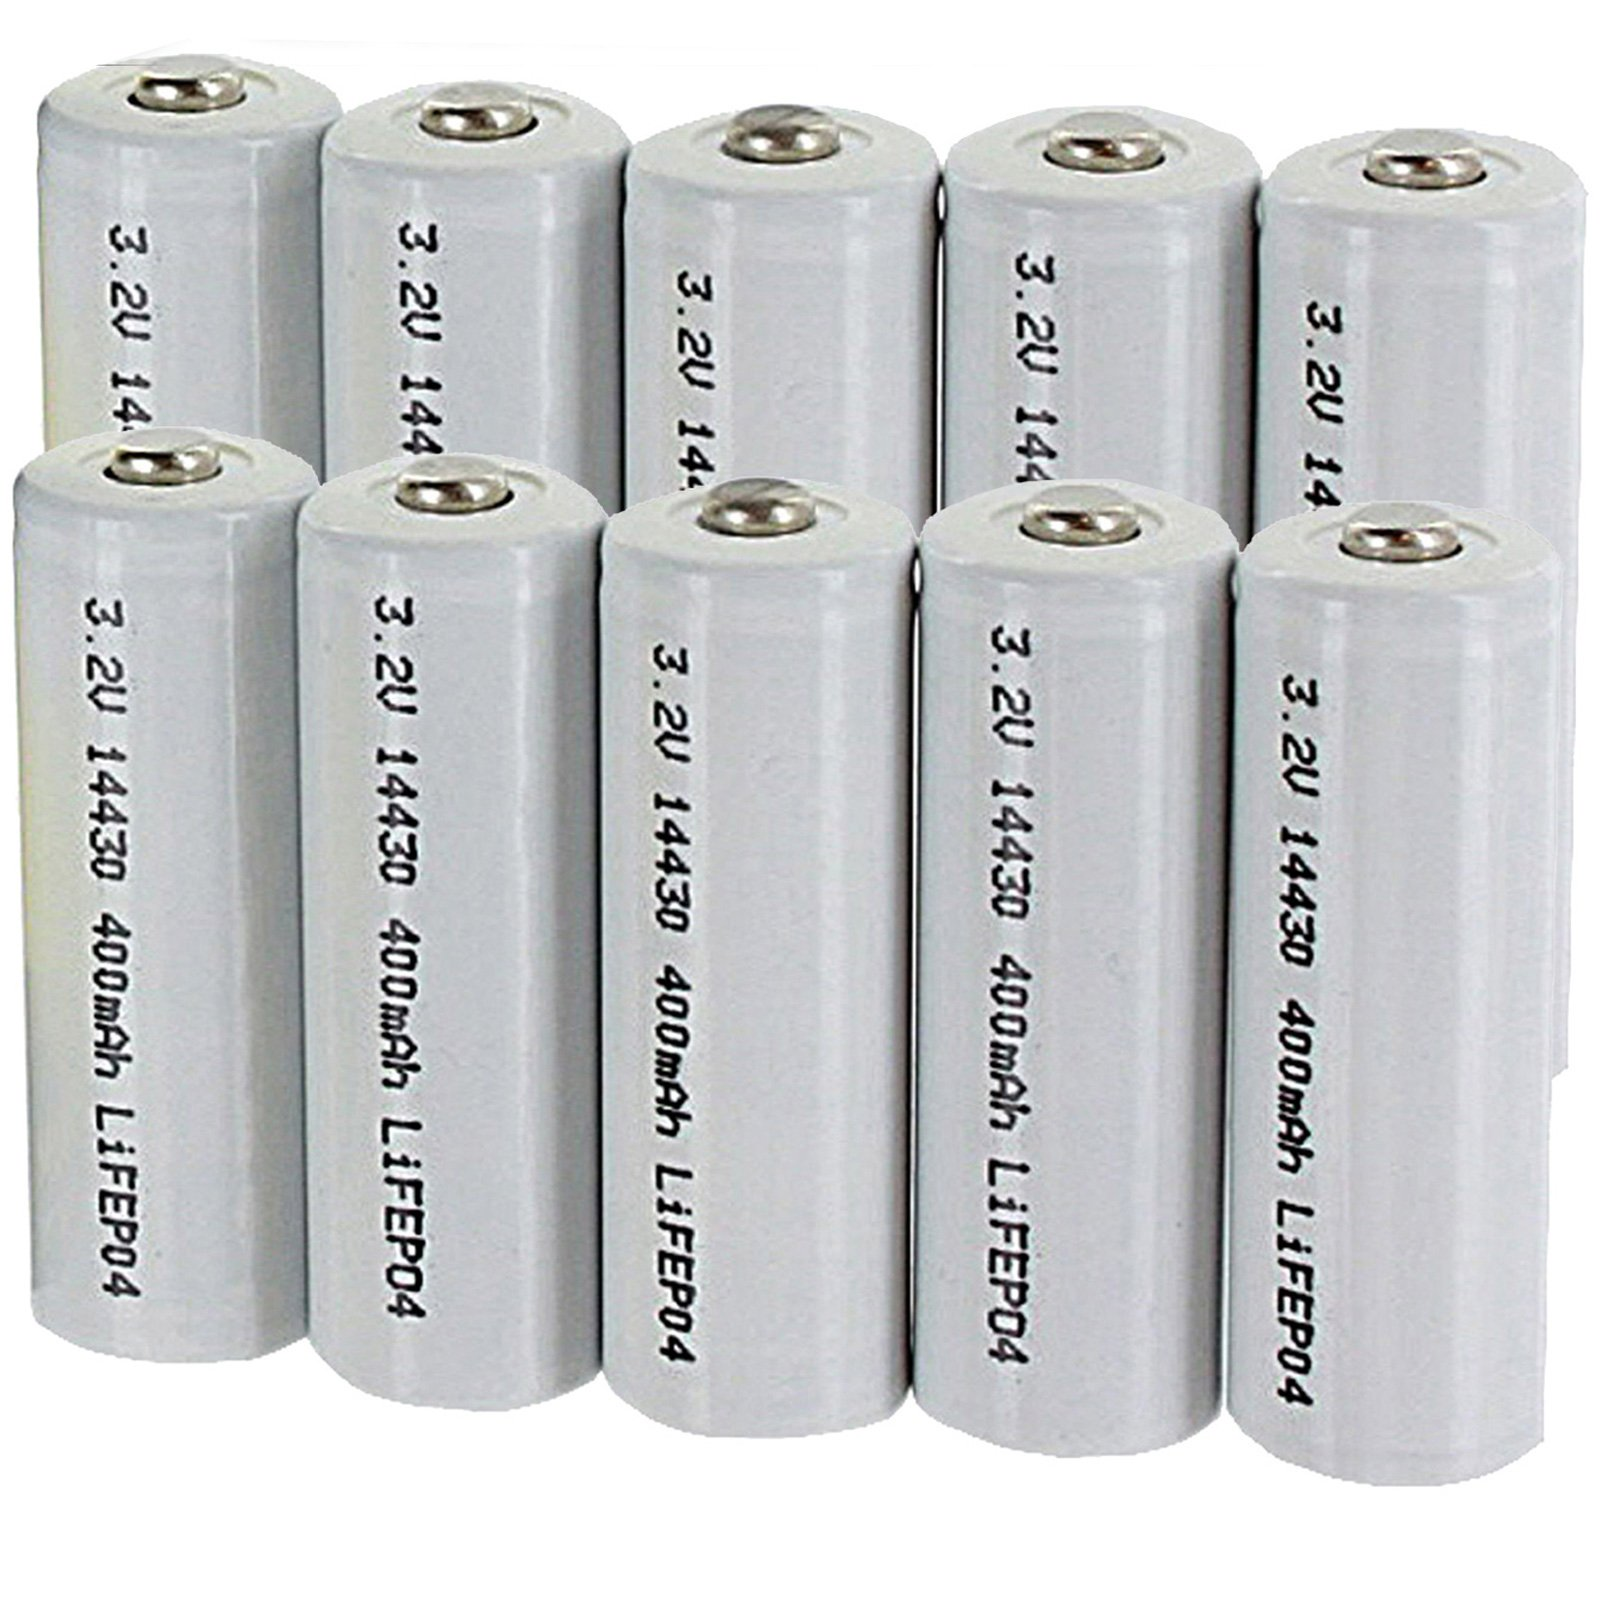 10pk 3.2V 400mAh Li-FePO4 Size 14430 Rechargeable Batteries For Solar Lights Garden Lights , Security System Panels, LED Flashlights FAST USA SHIPPING